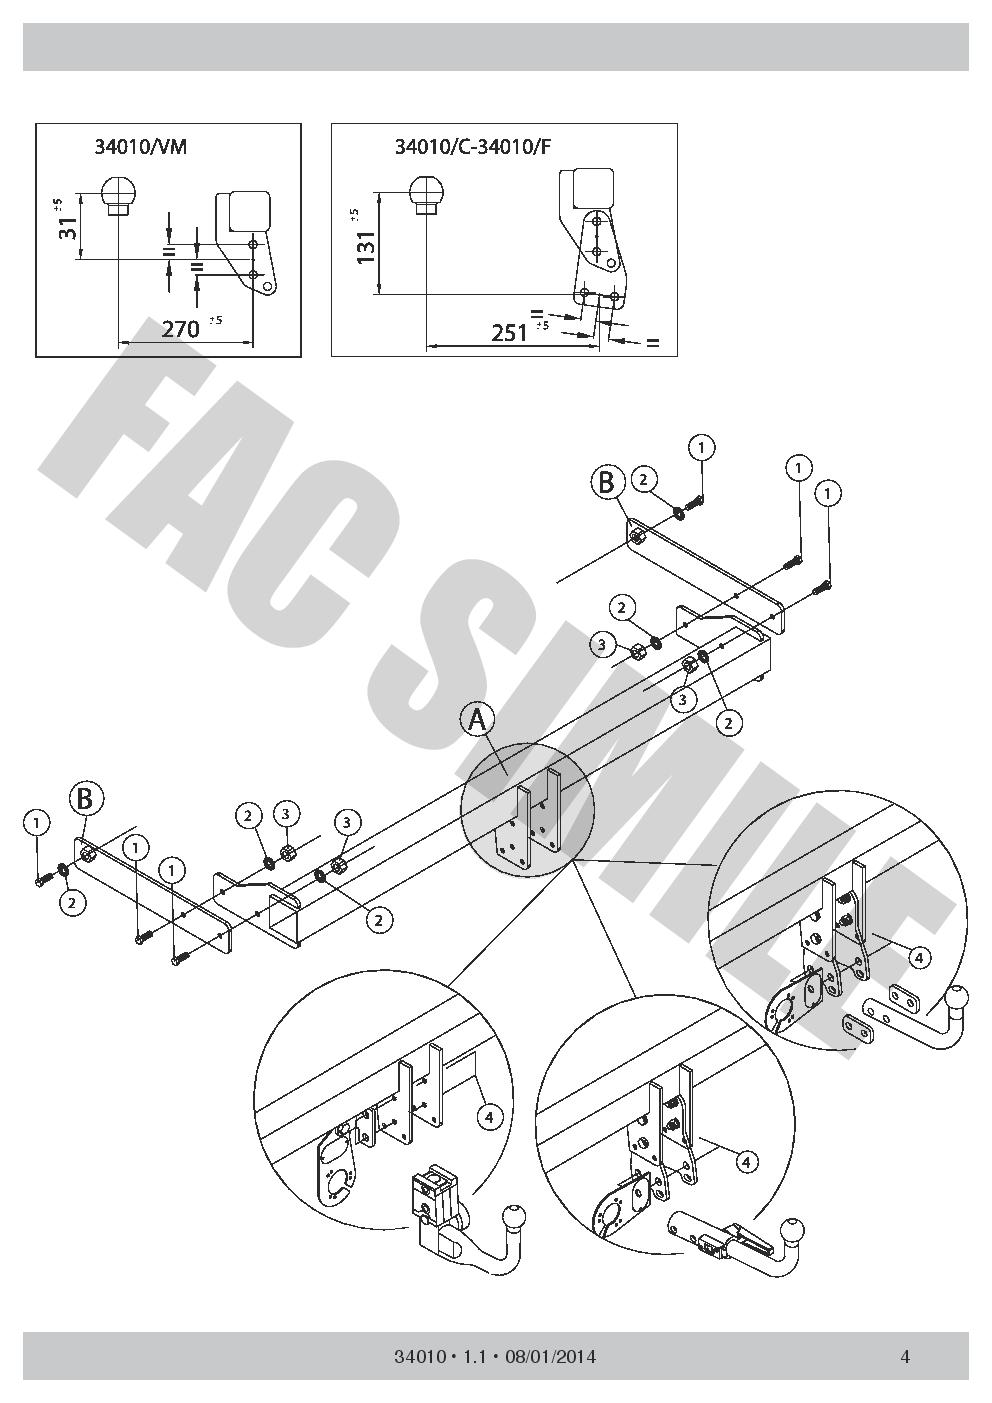 hight resolution of vertical detachable towbar 7p wiring for skoda octavia